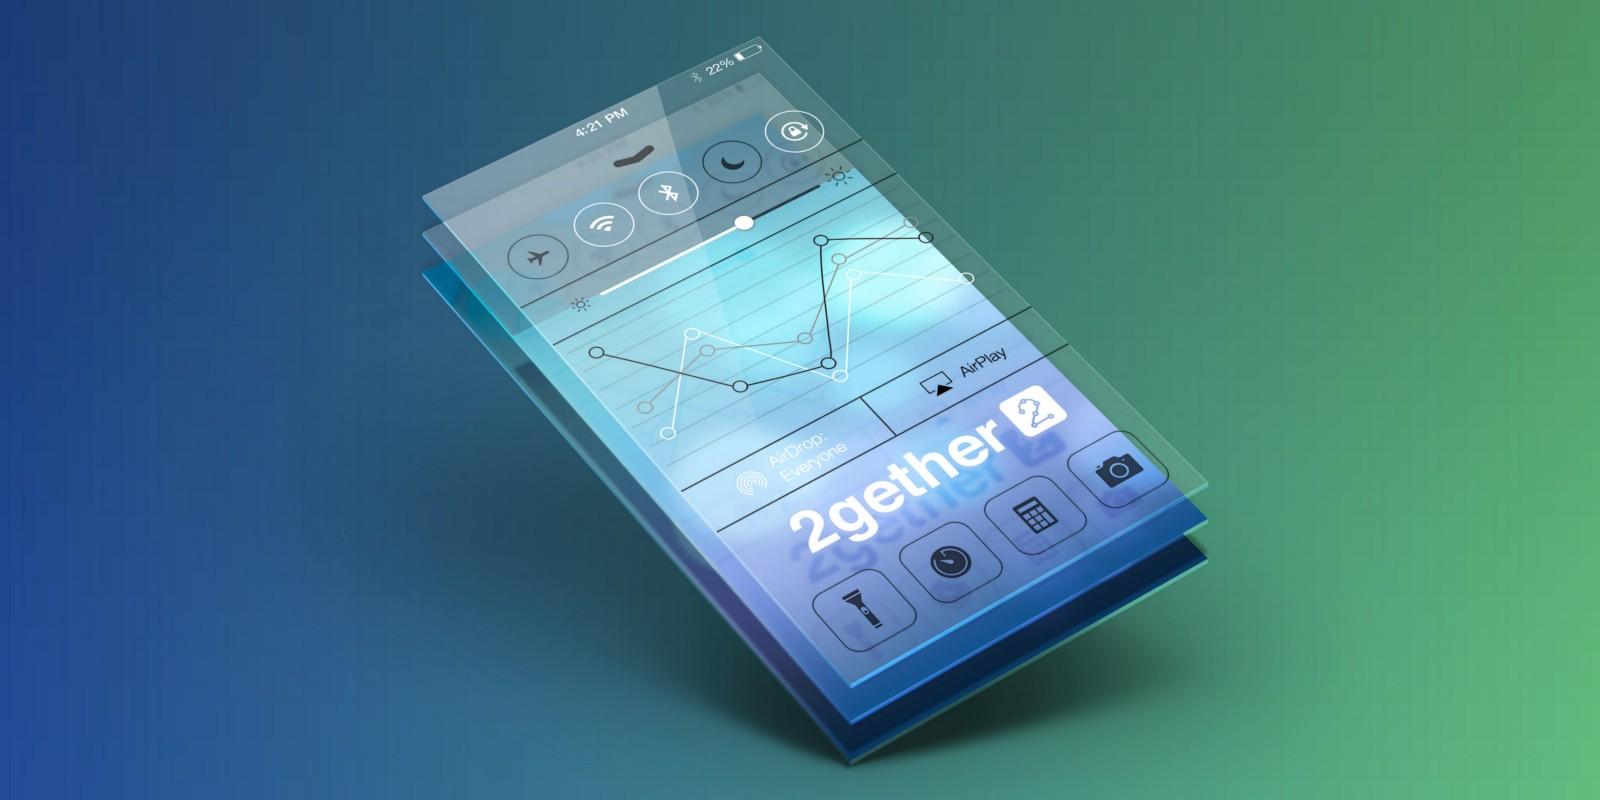 Startup bancaria lanzará tarjeta Visa que funciona con 7 criptomonedas